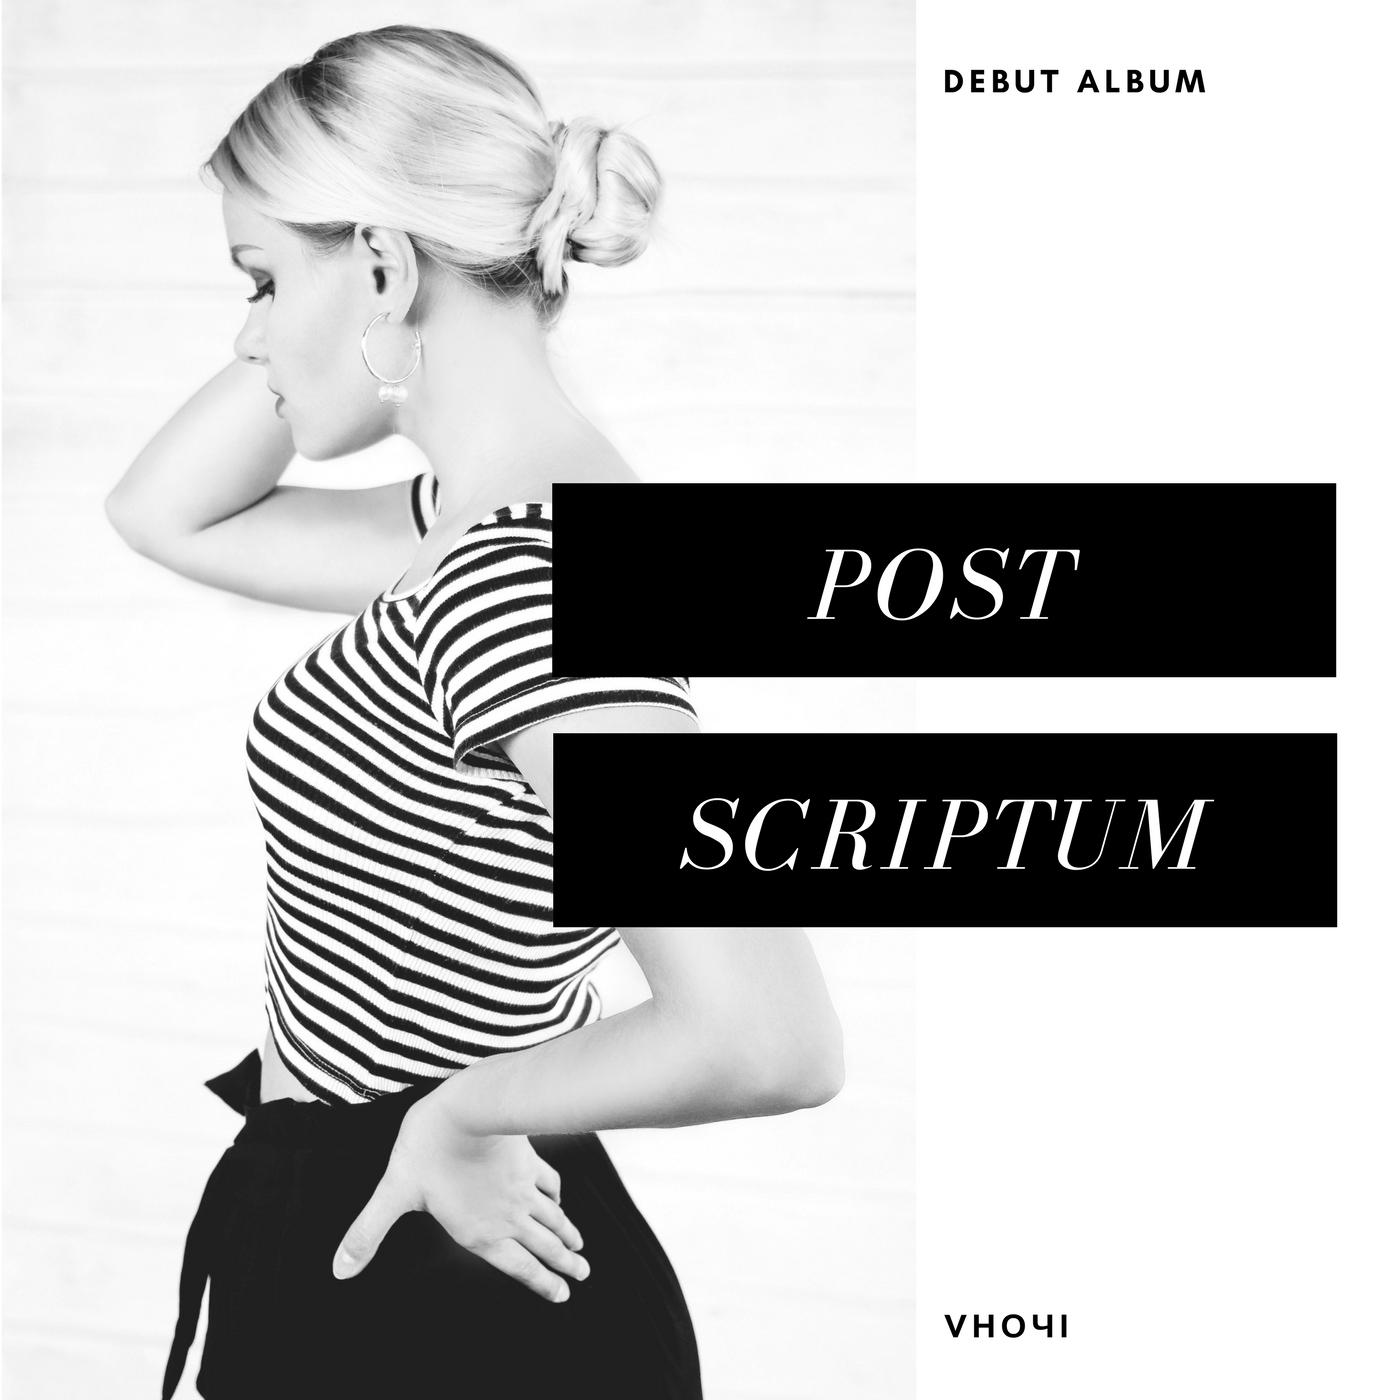 VНОЧІ – Post Scriptum